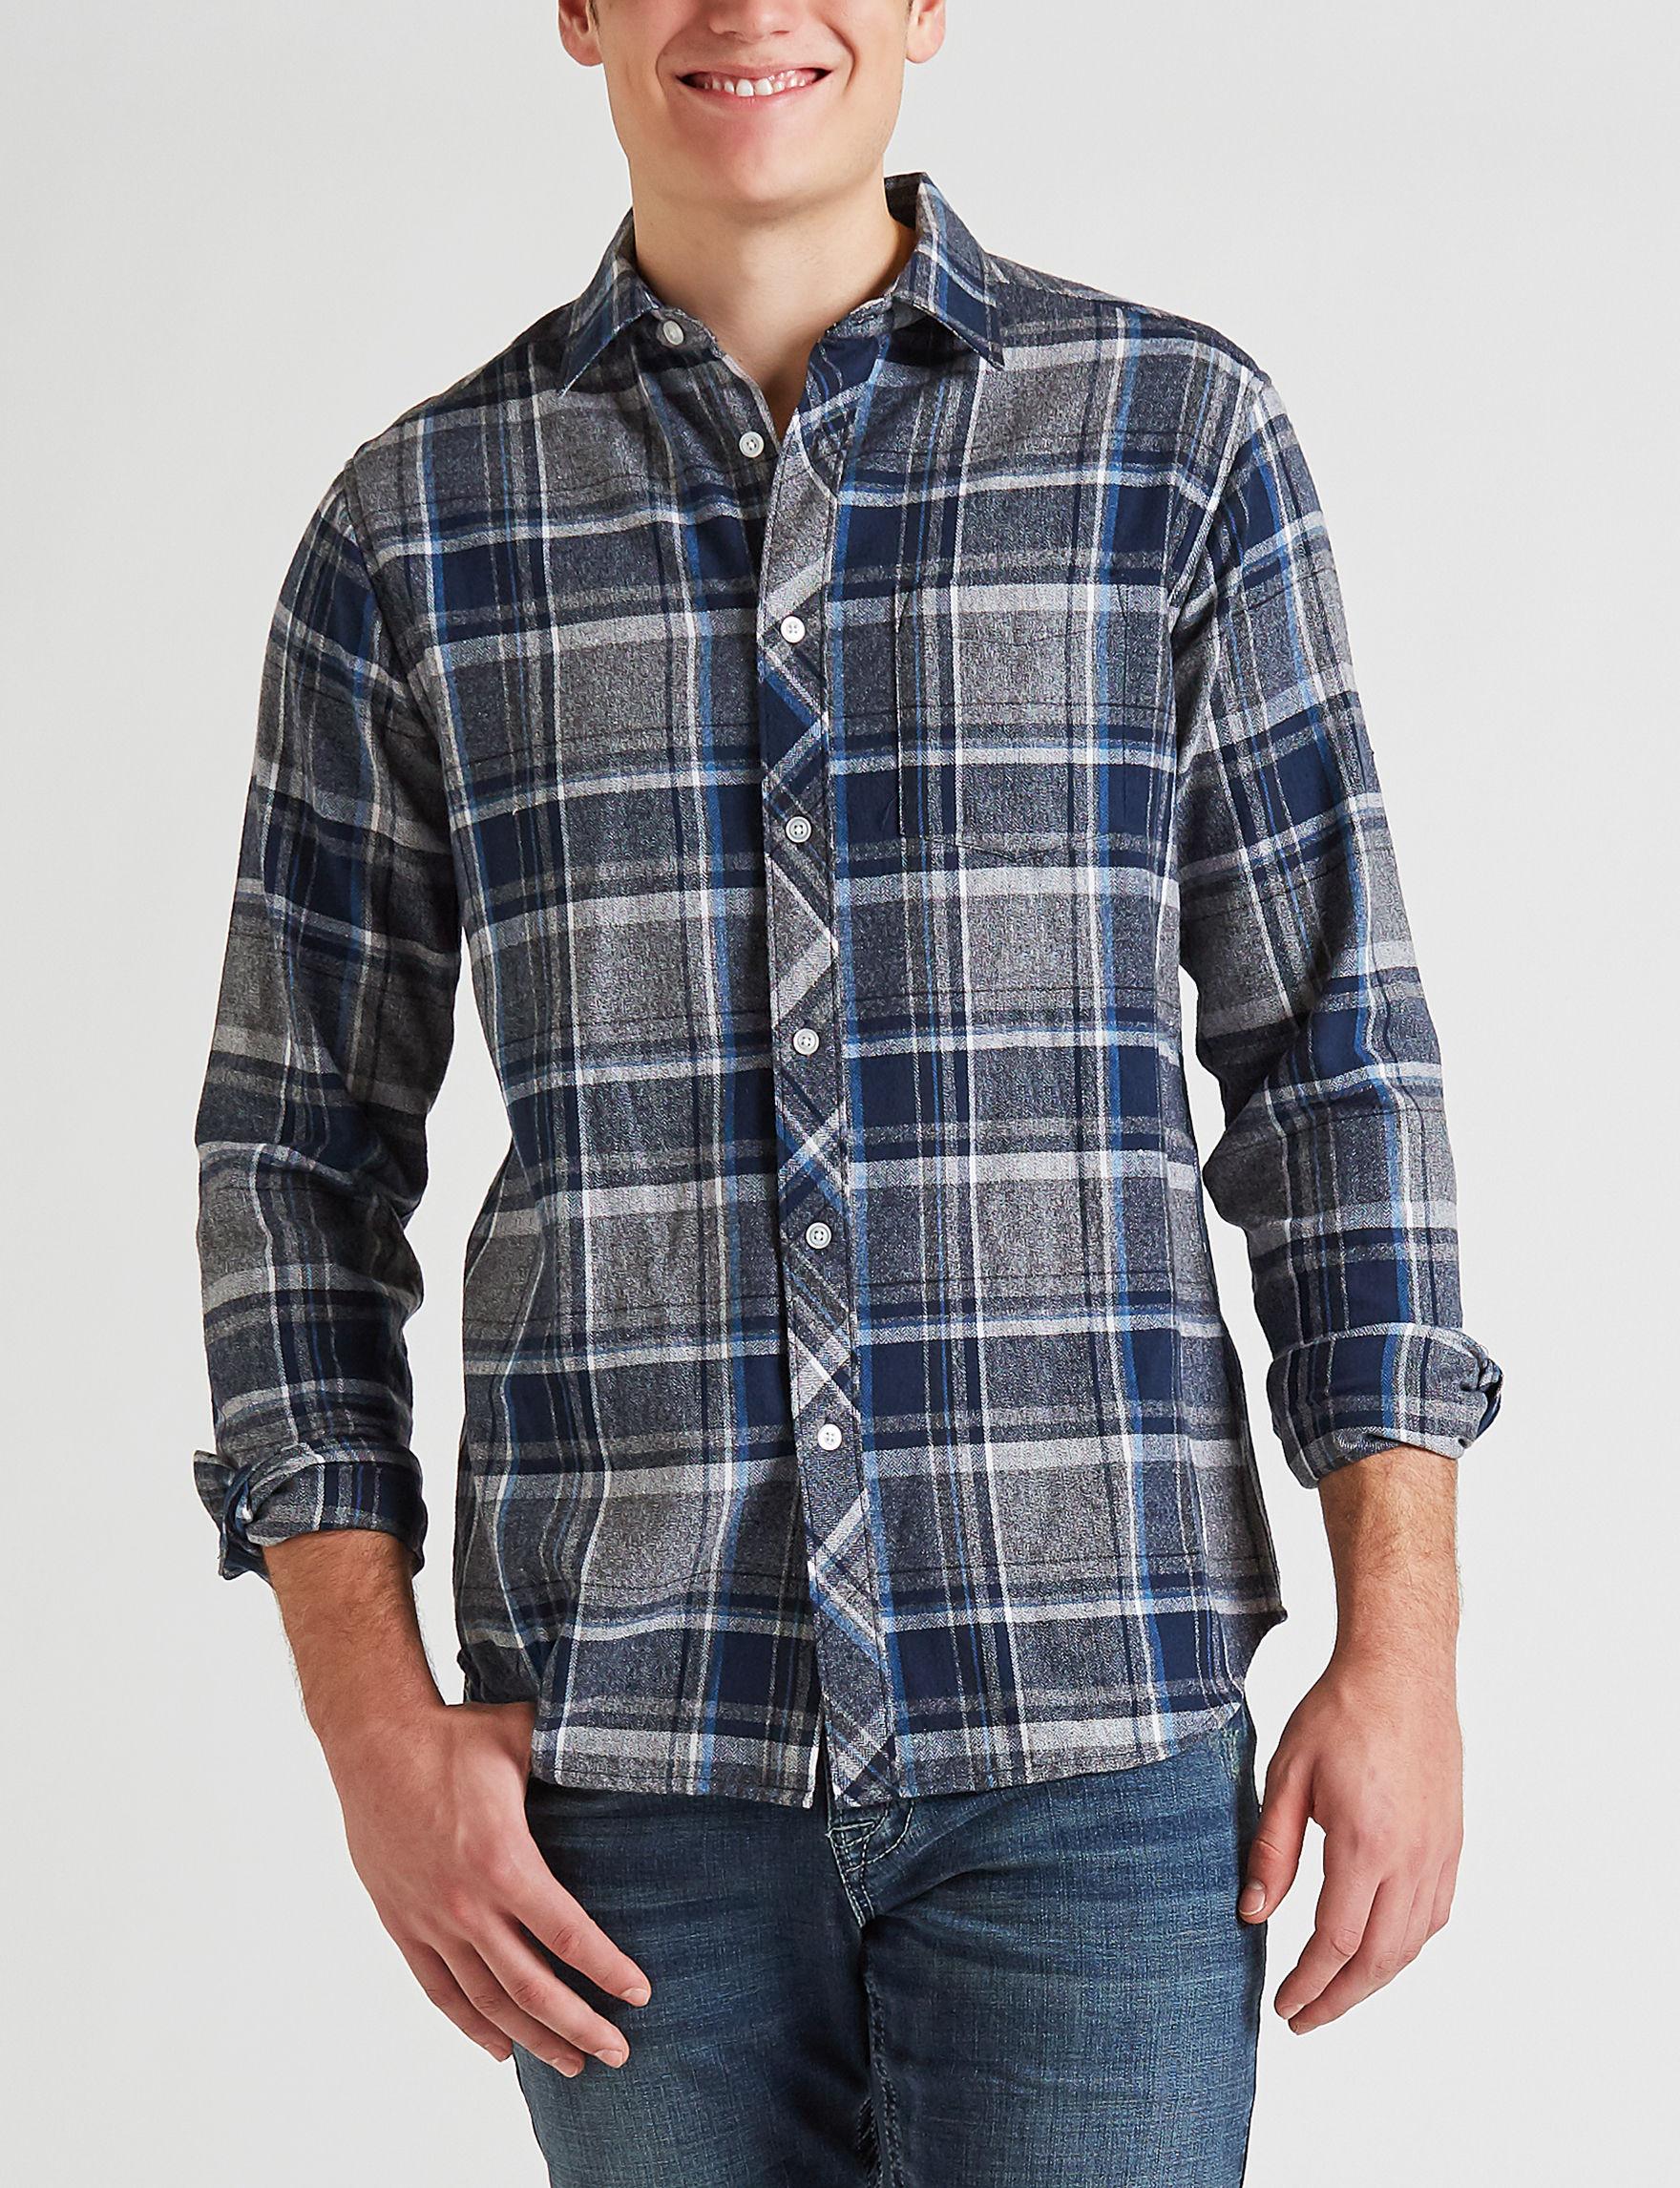 Rustic Blue Navy Plaid Casual Button Down Shirts